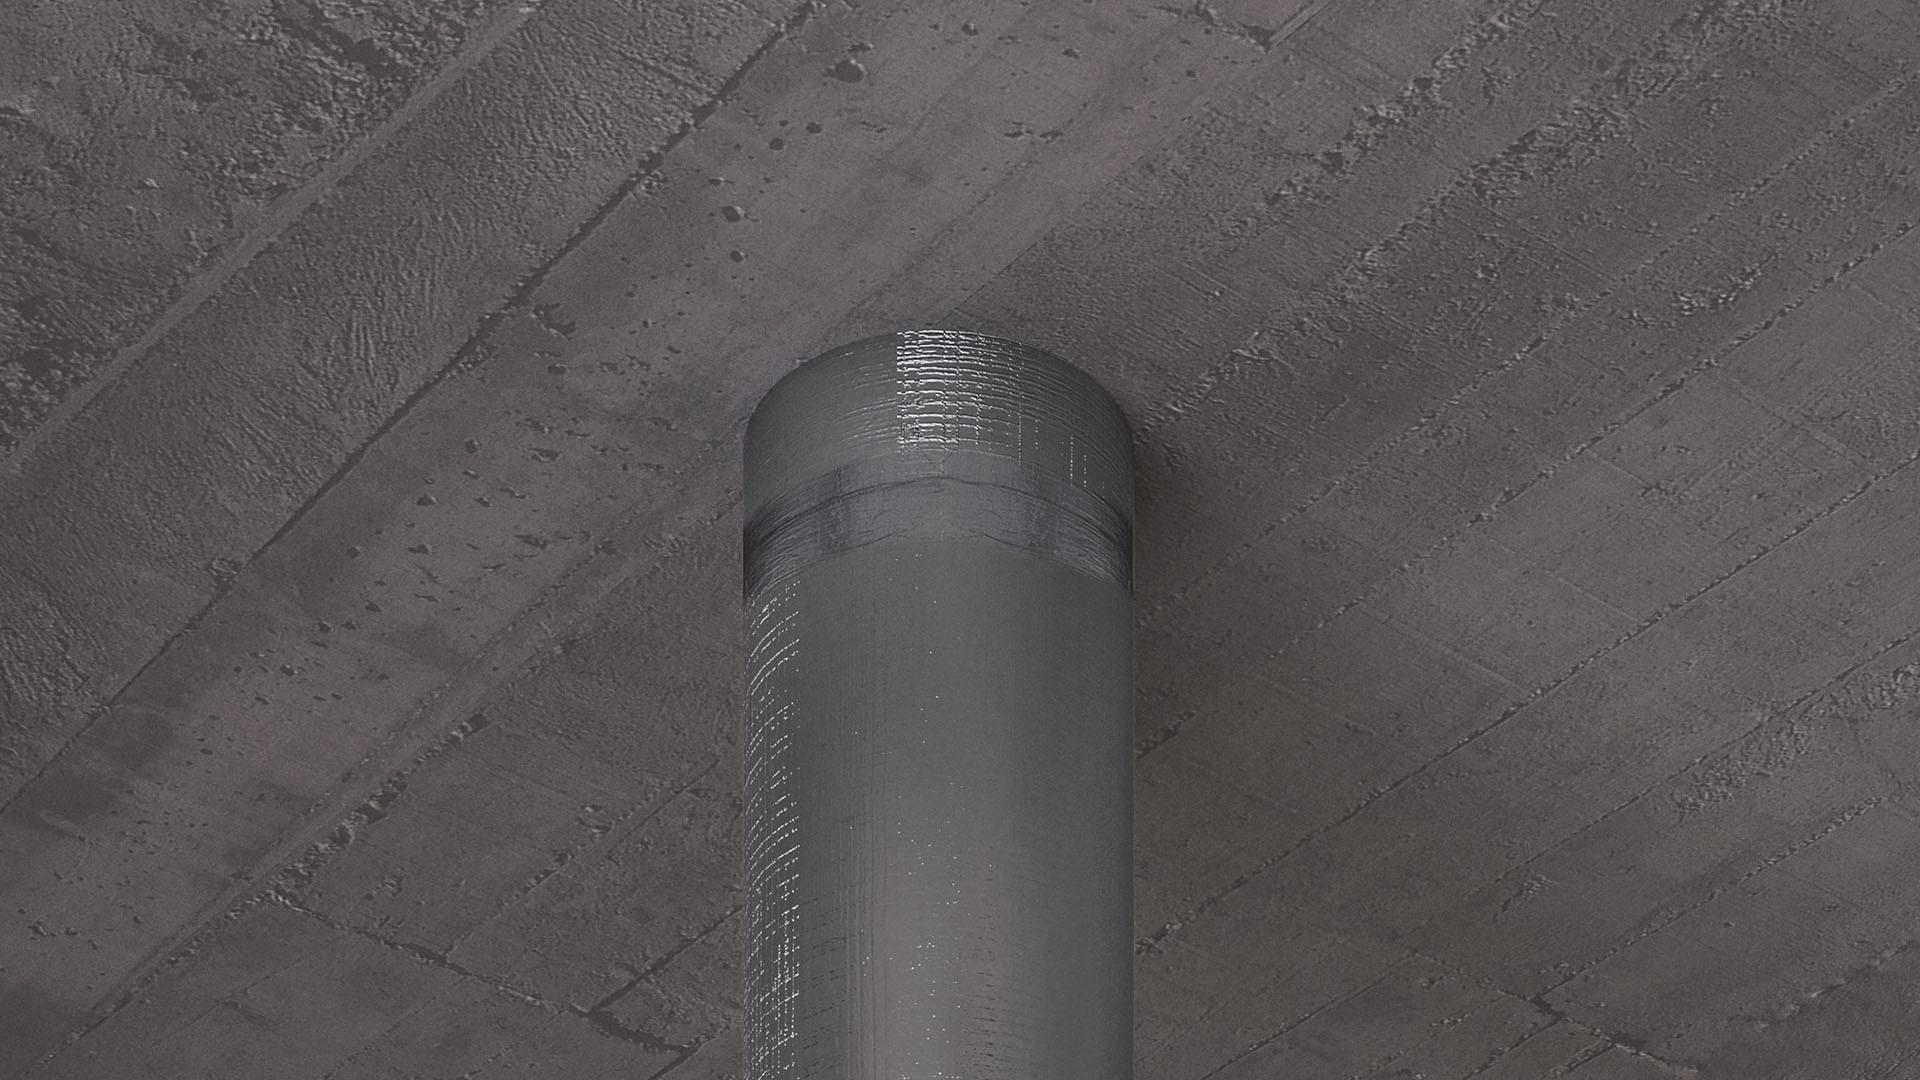 Conlit 150 U, productfoto, HVAC-FP, brandwerende toepassingen